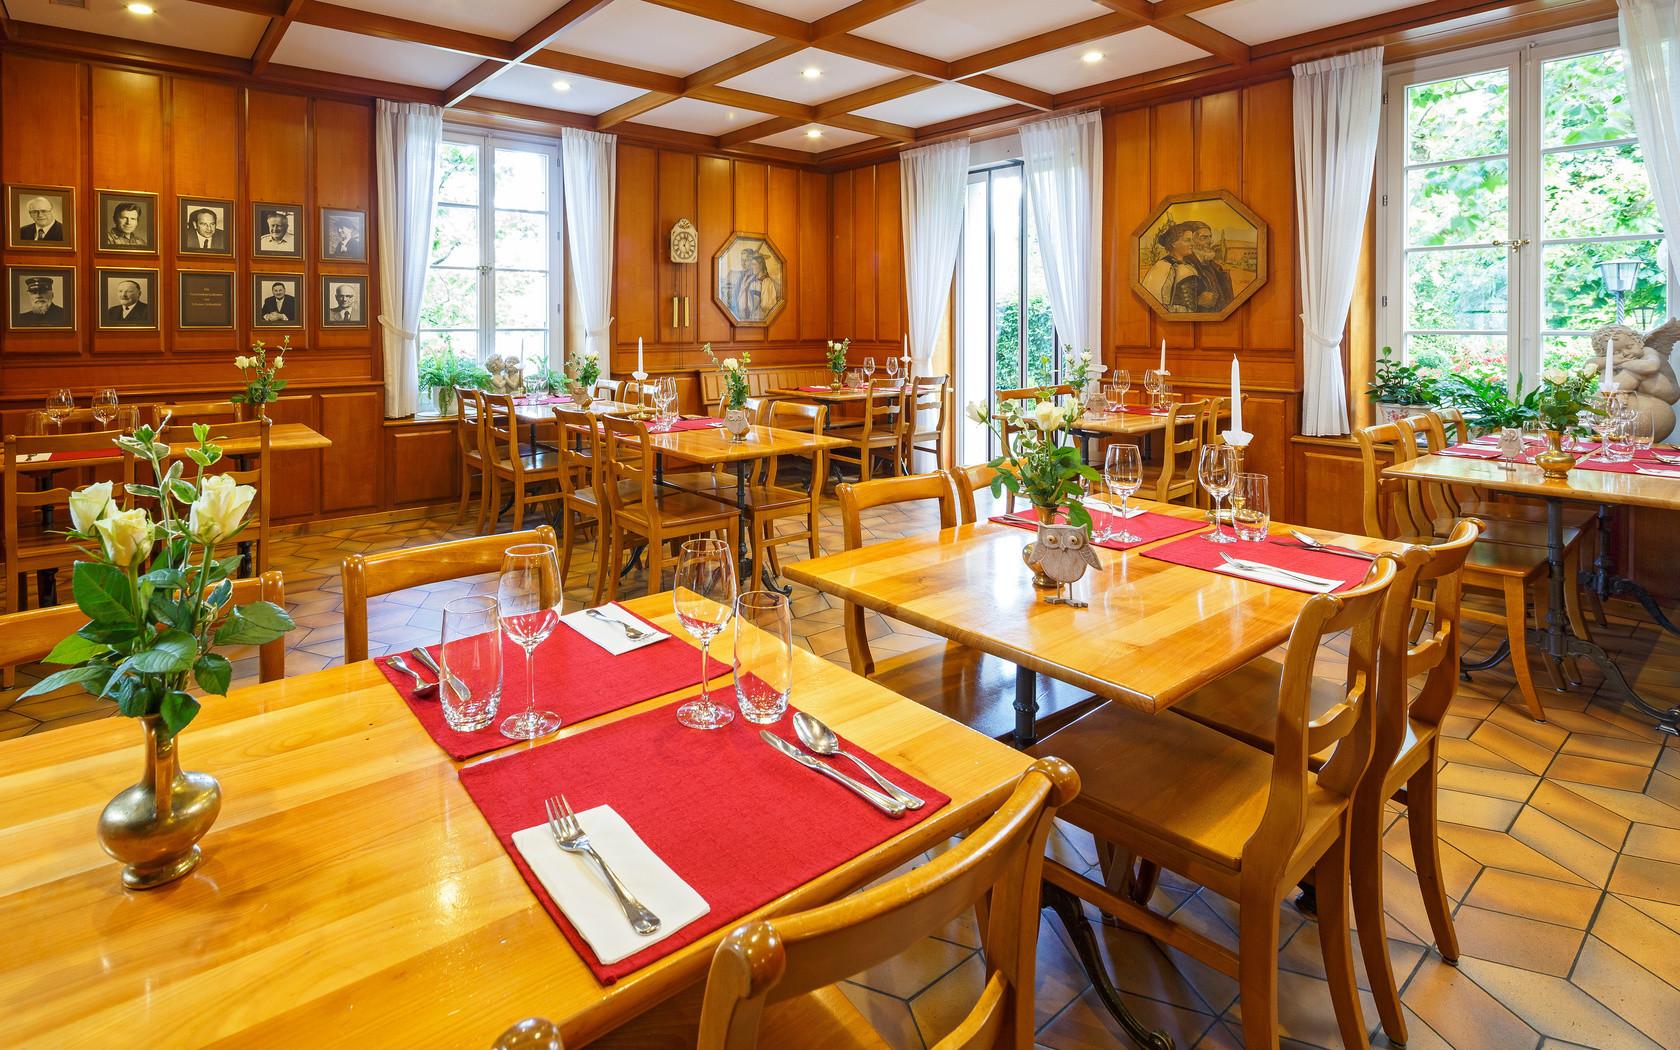 Restaurant gasthof sch nb hl bern restaurants sch nb hl - Stoel volwassen kamer ...